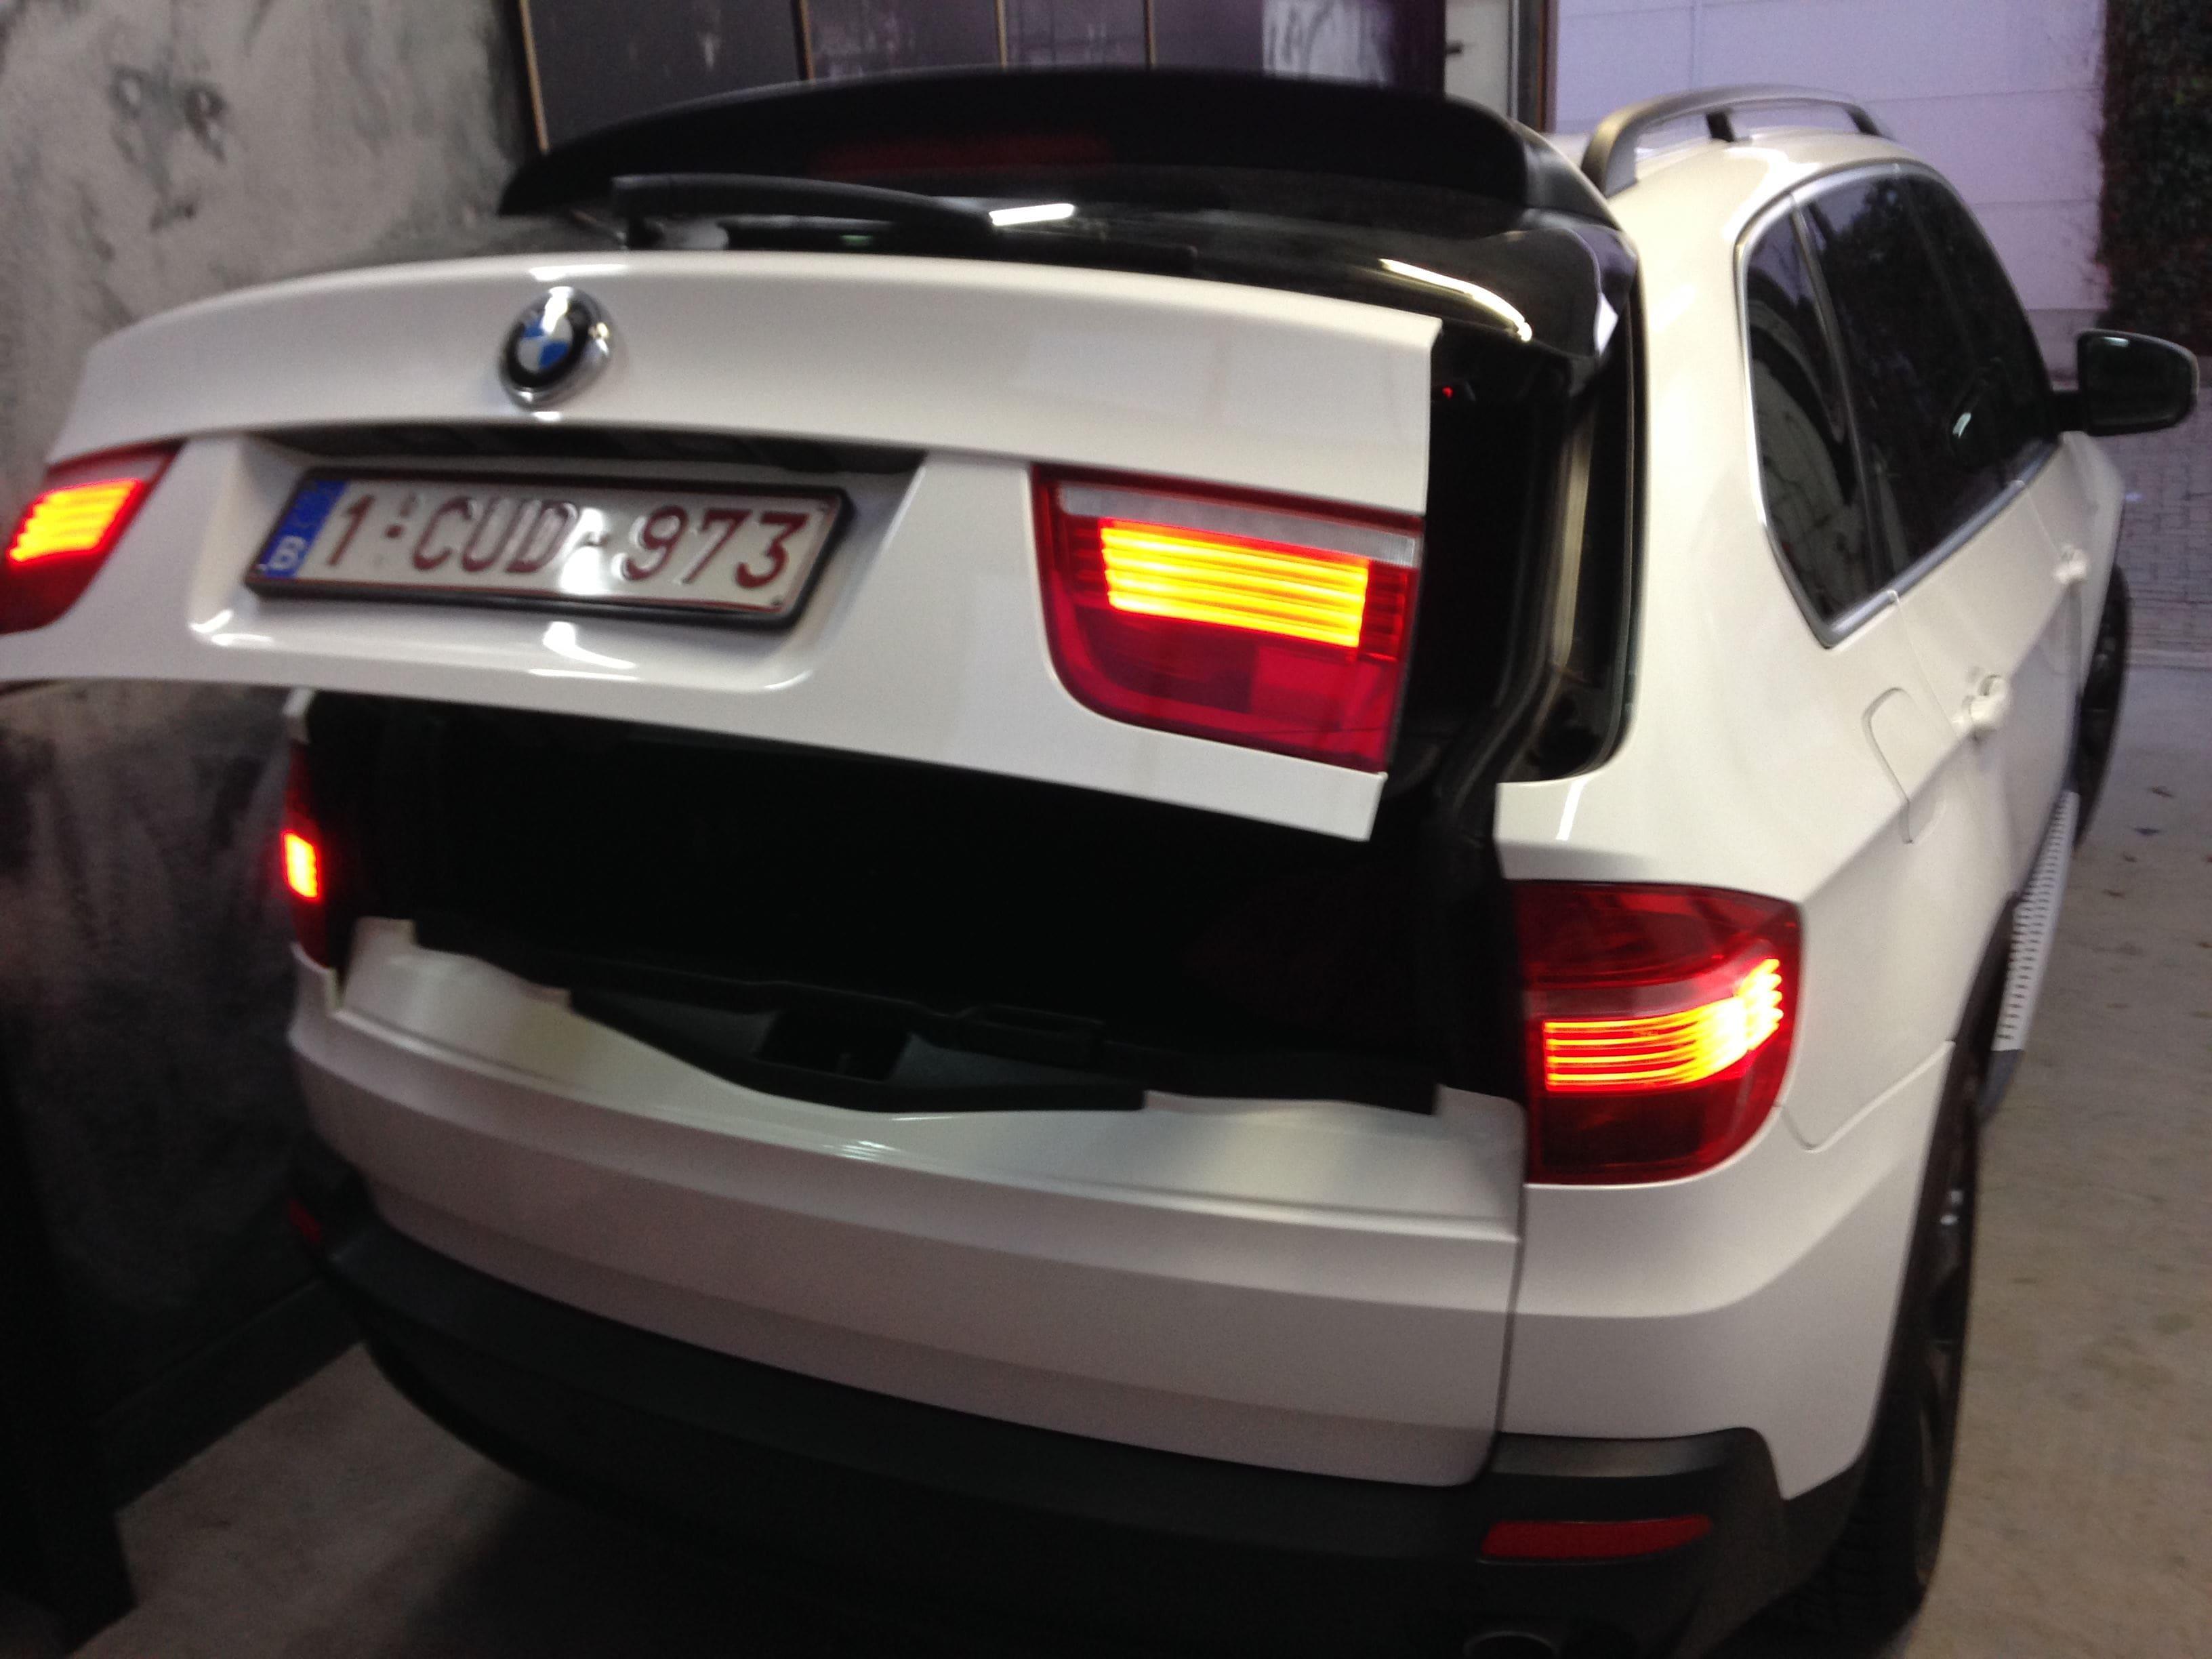 BMW X5 met Glossy White Wrap, Carwrapping door Wrapmyride.nu Foto-nr:5428, ©2021